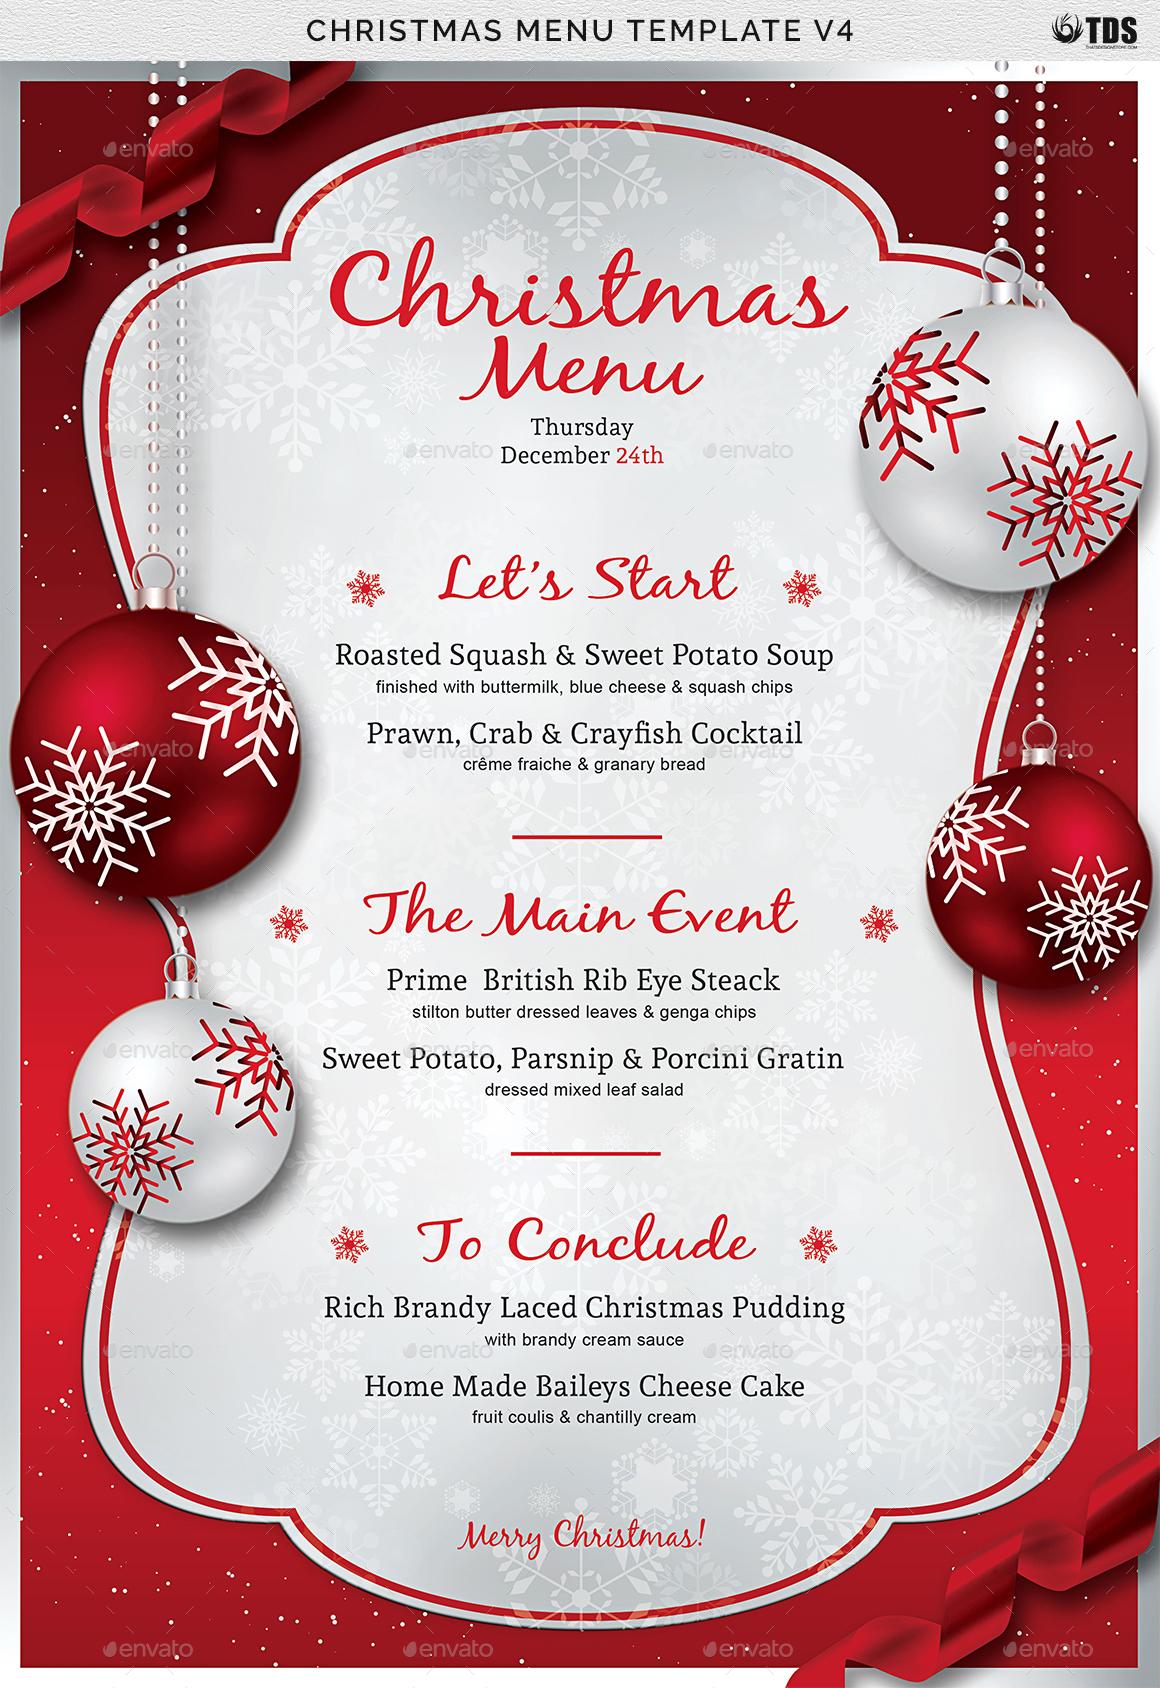 menu template v4jpg - Christmas Menu Template